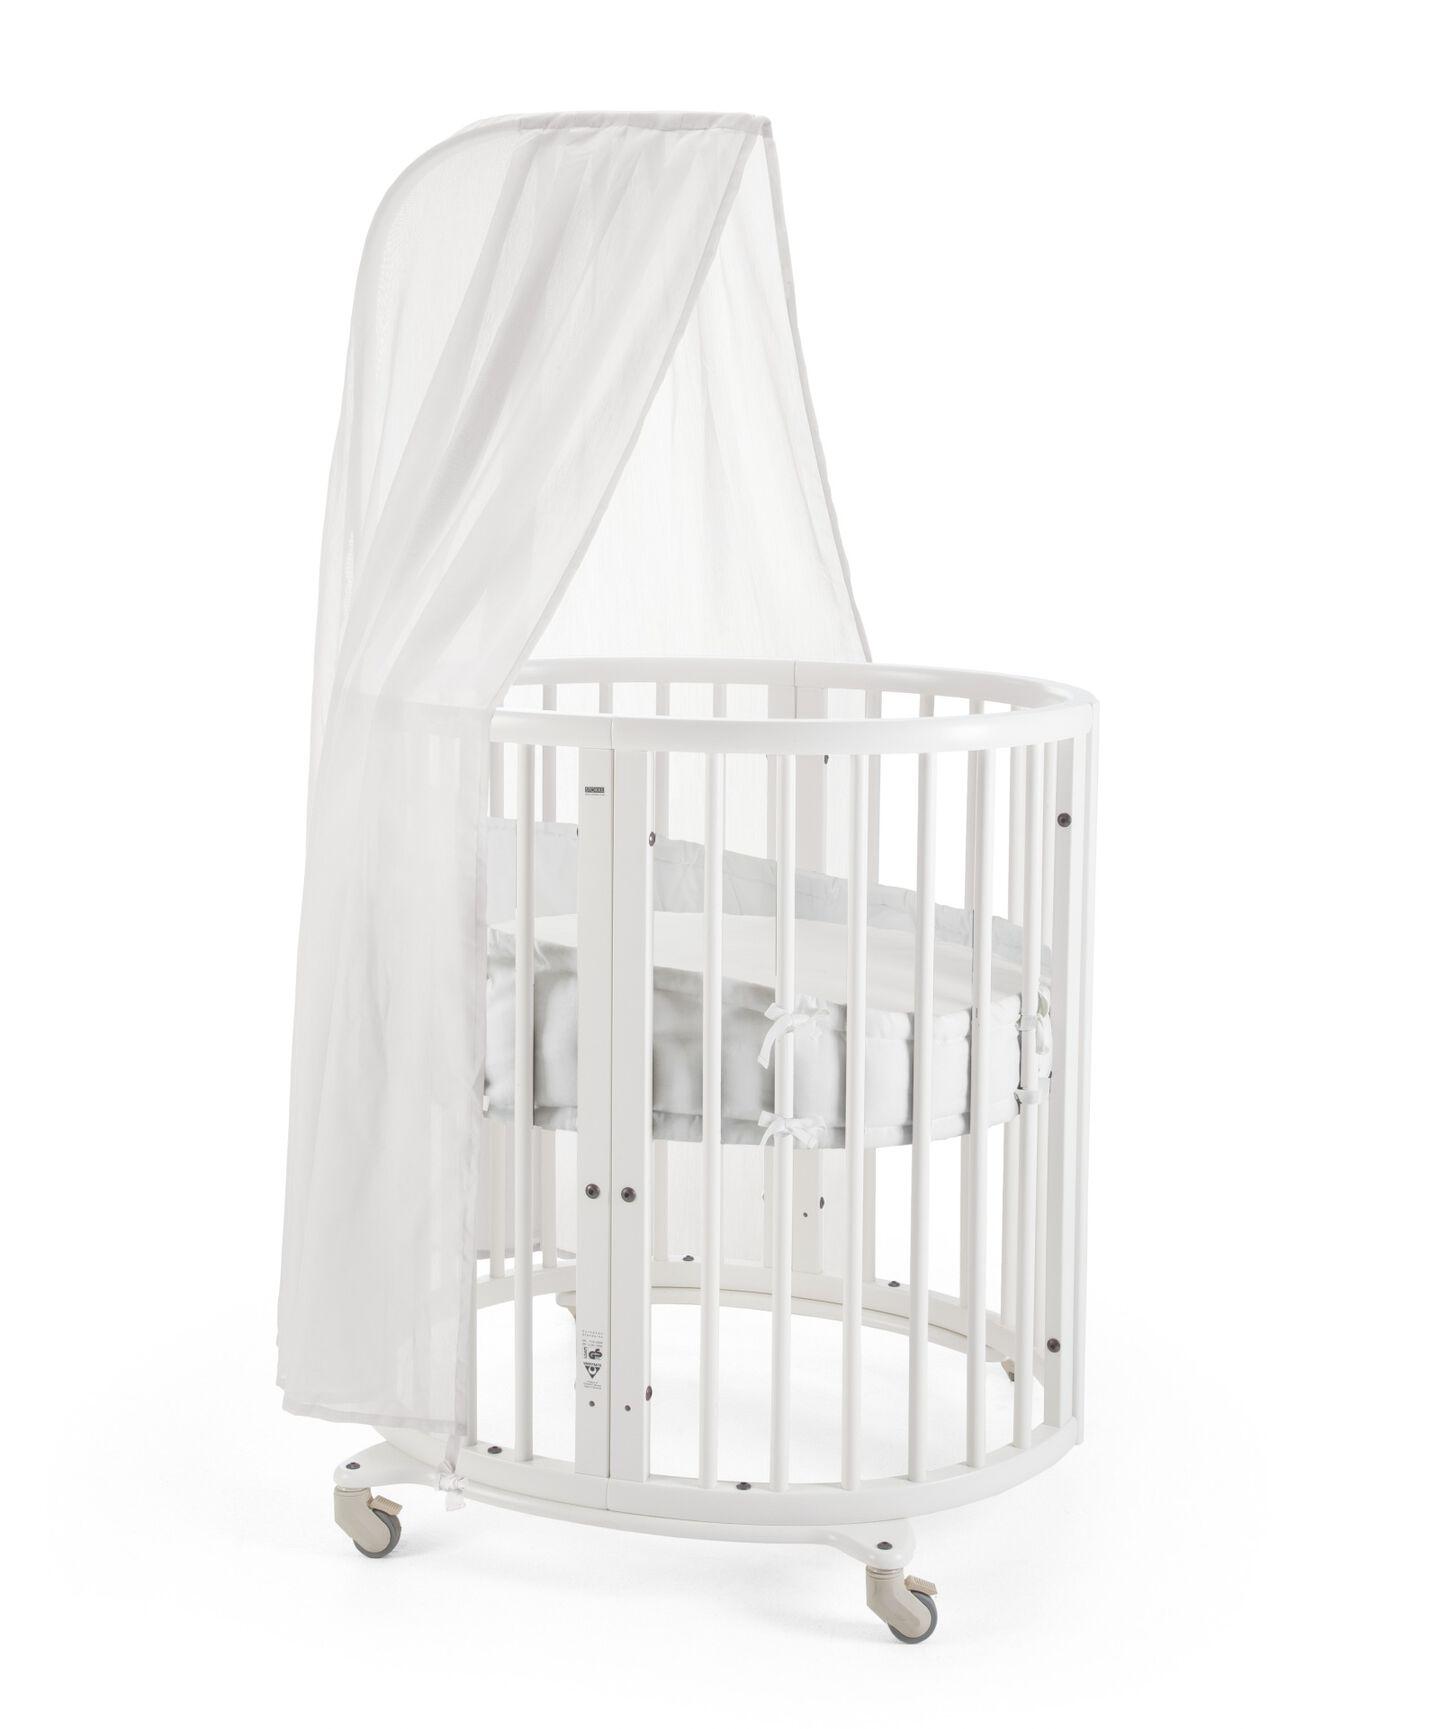 Stokke® Sleepi Mini, White. Canopy, Bumper and Fitted Sheet White.